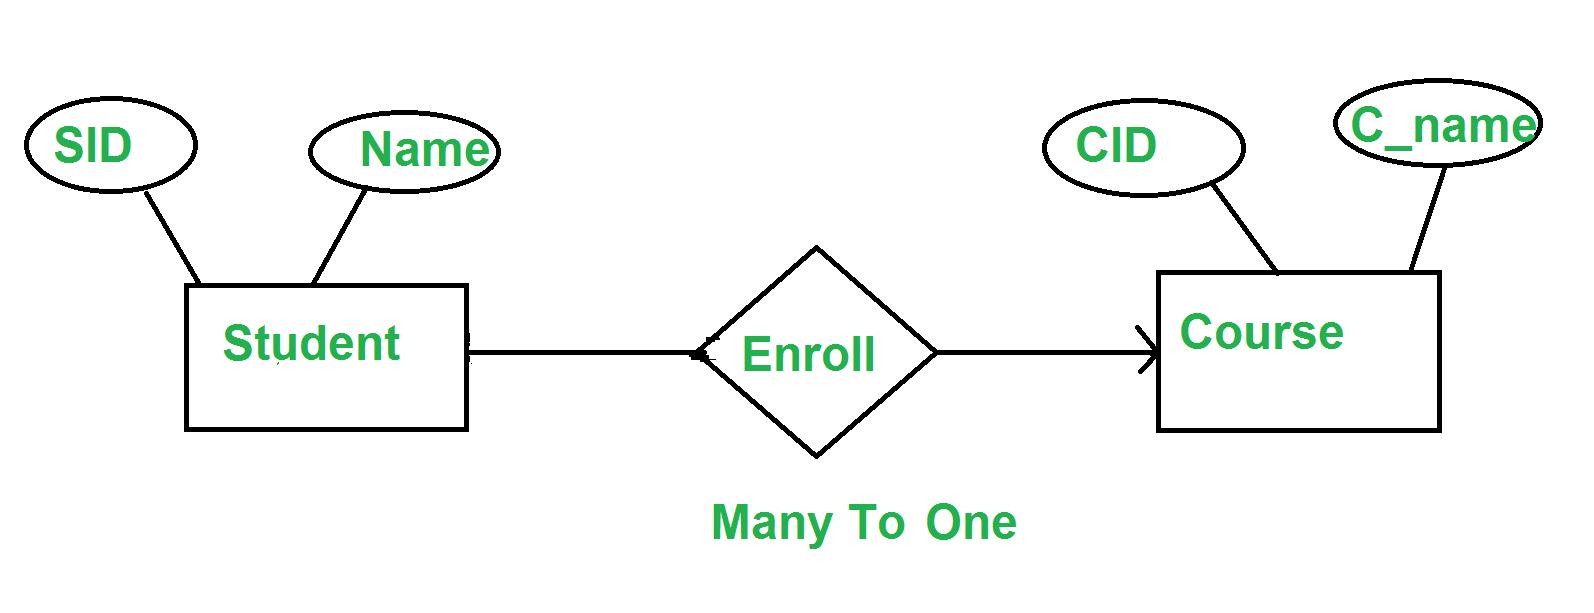 Minimization Of Er Diagram - Geeksforgeeks intended for Er Diagram Practice Examples